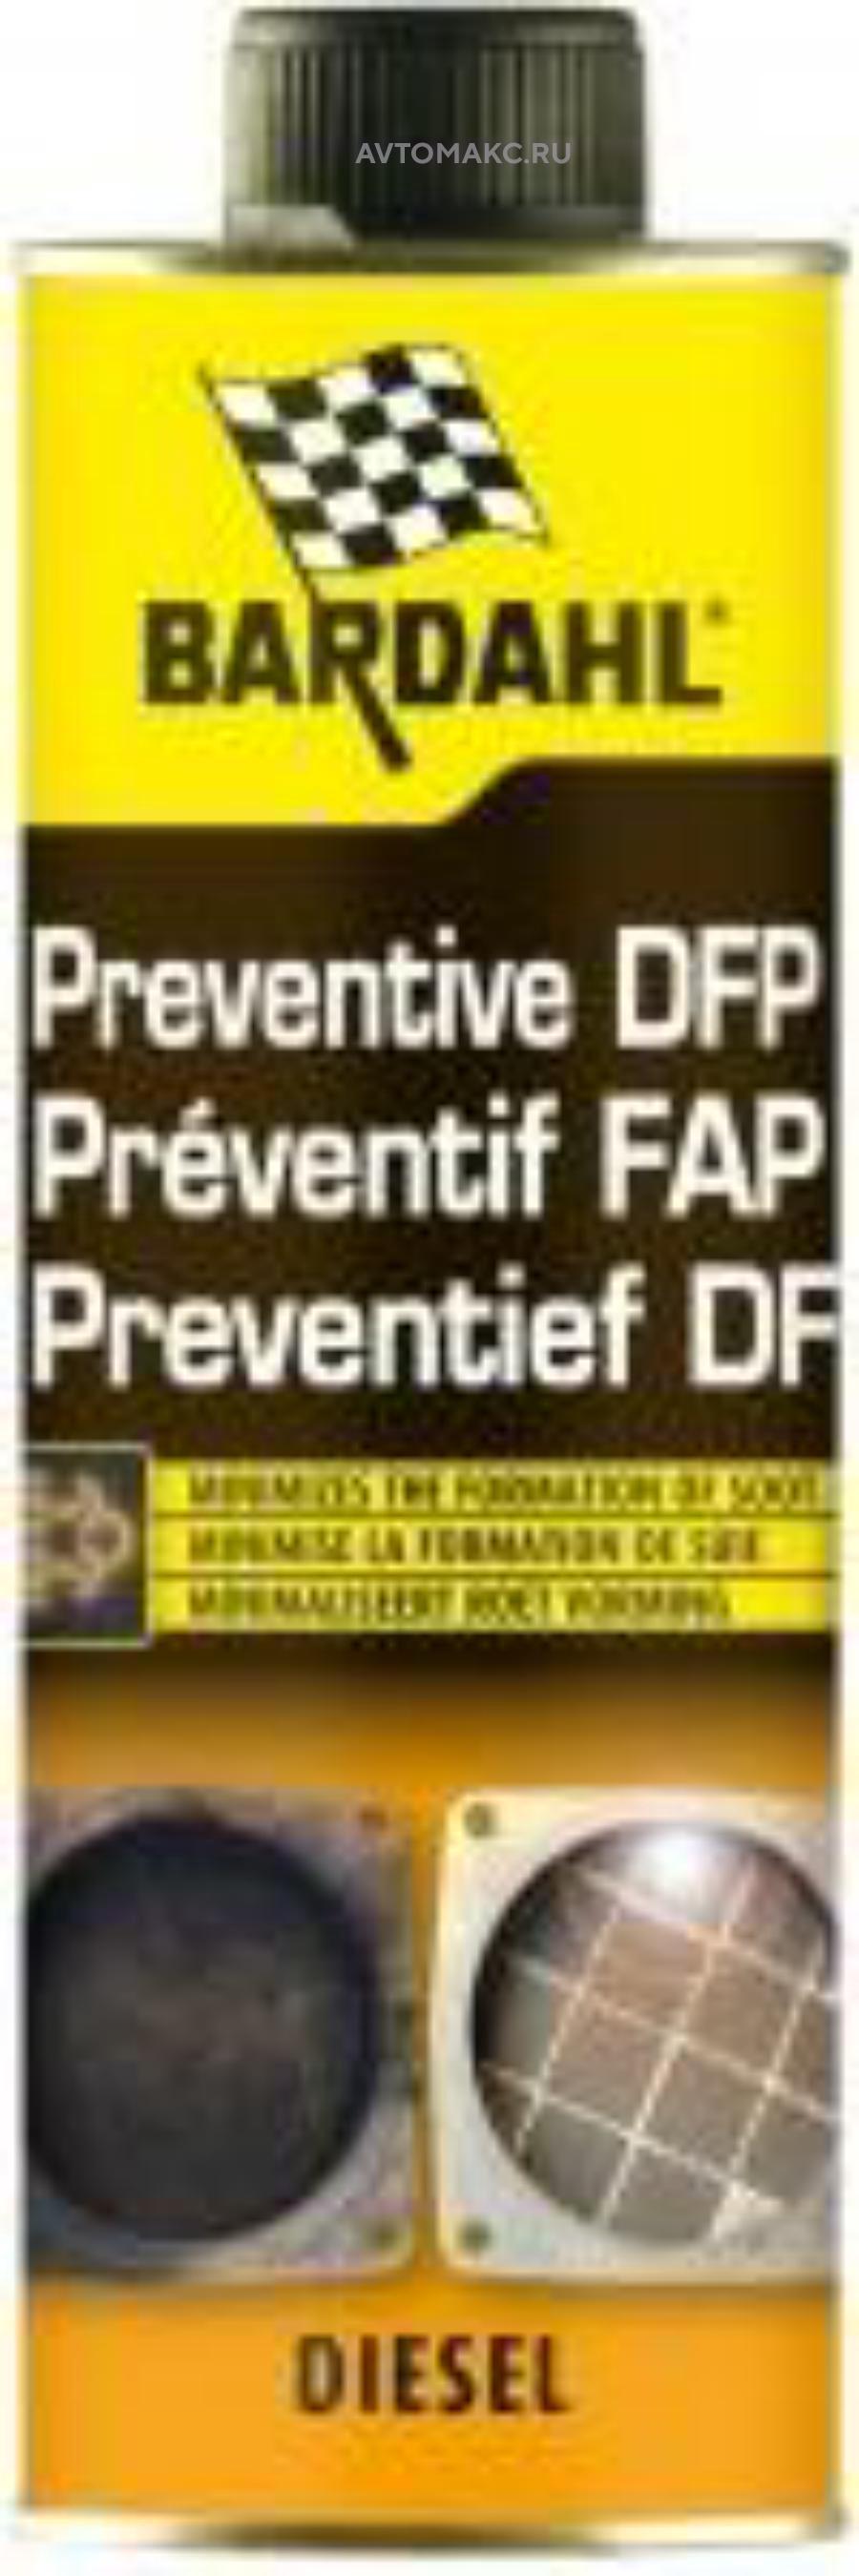 Добавка в дизельное топливо (на 15 л) Preventive Dpf Treatment 300 мл (3612)